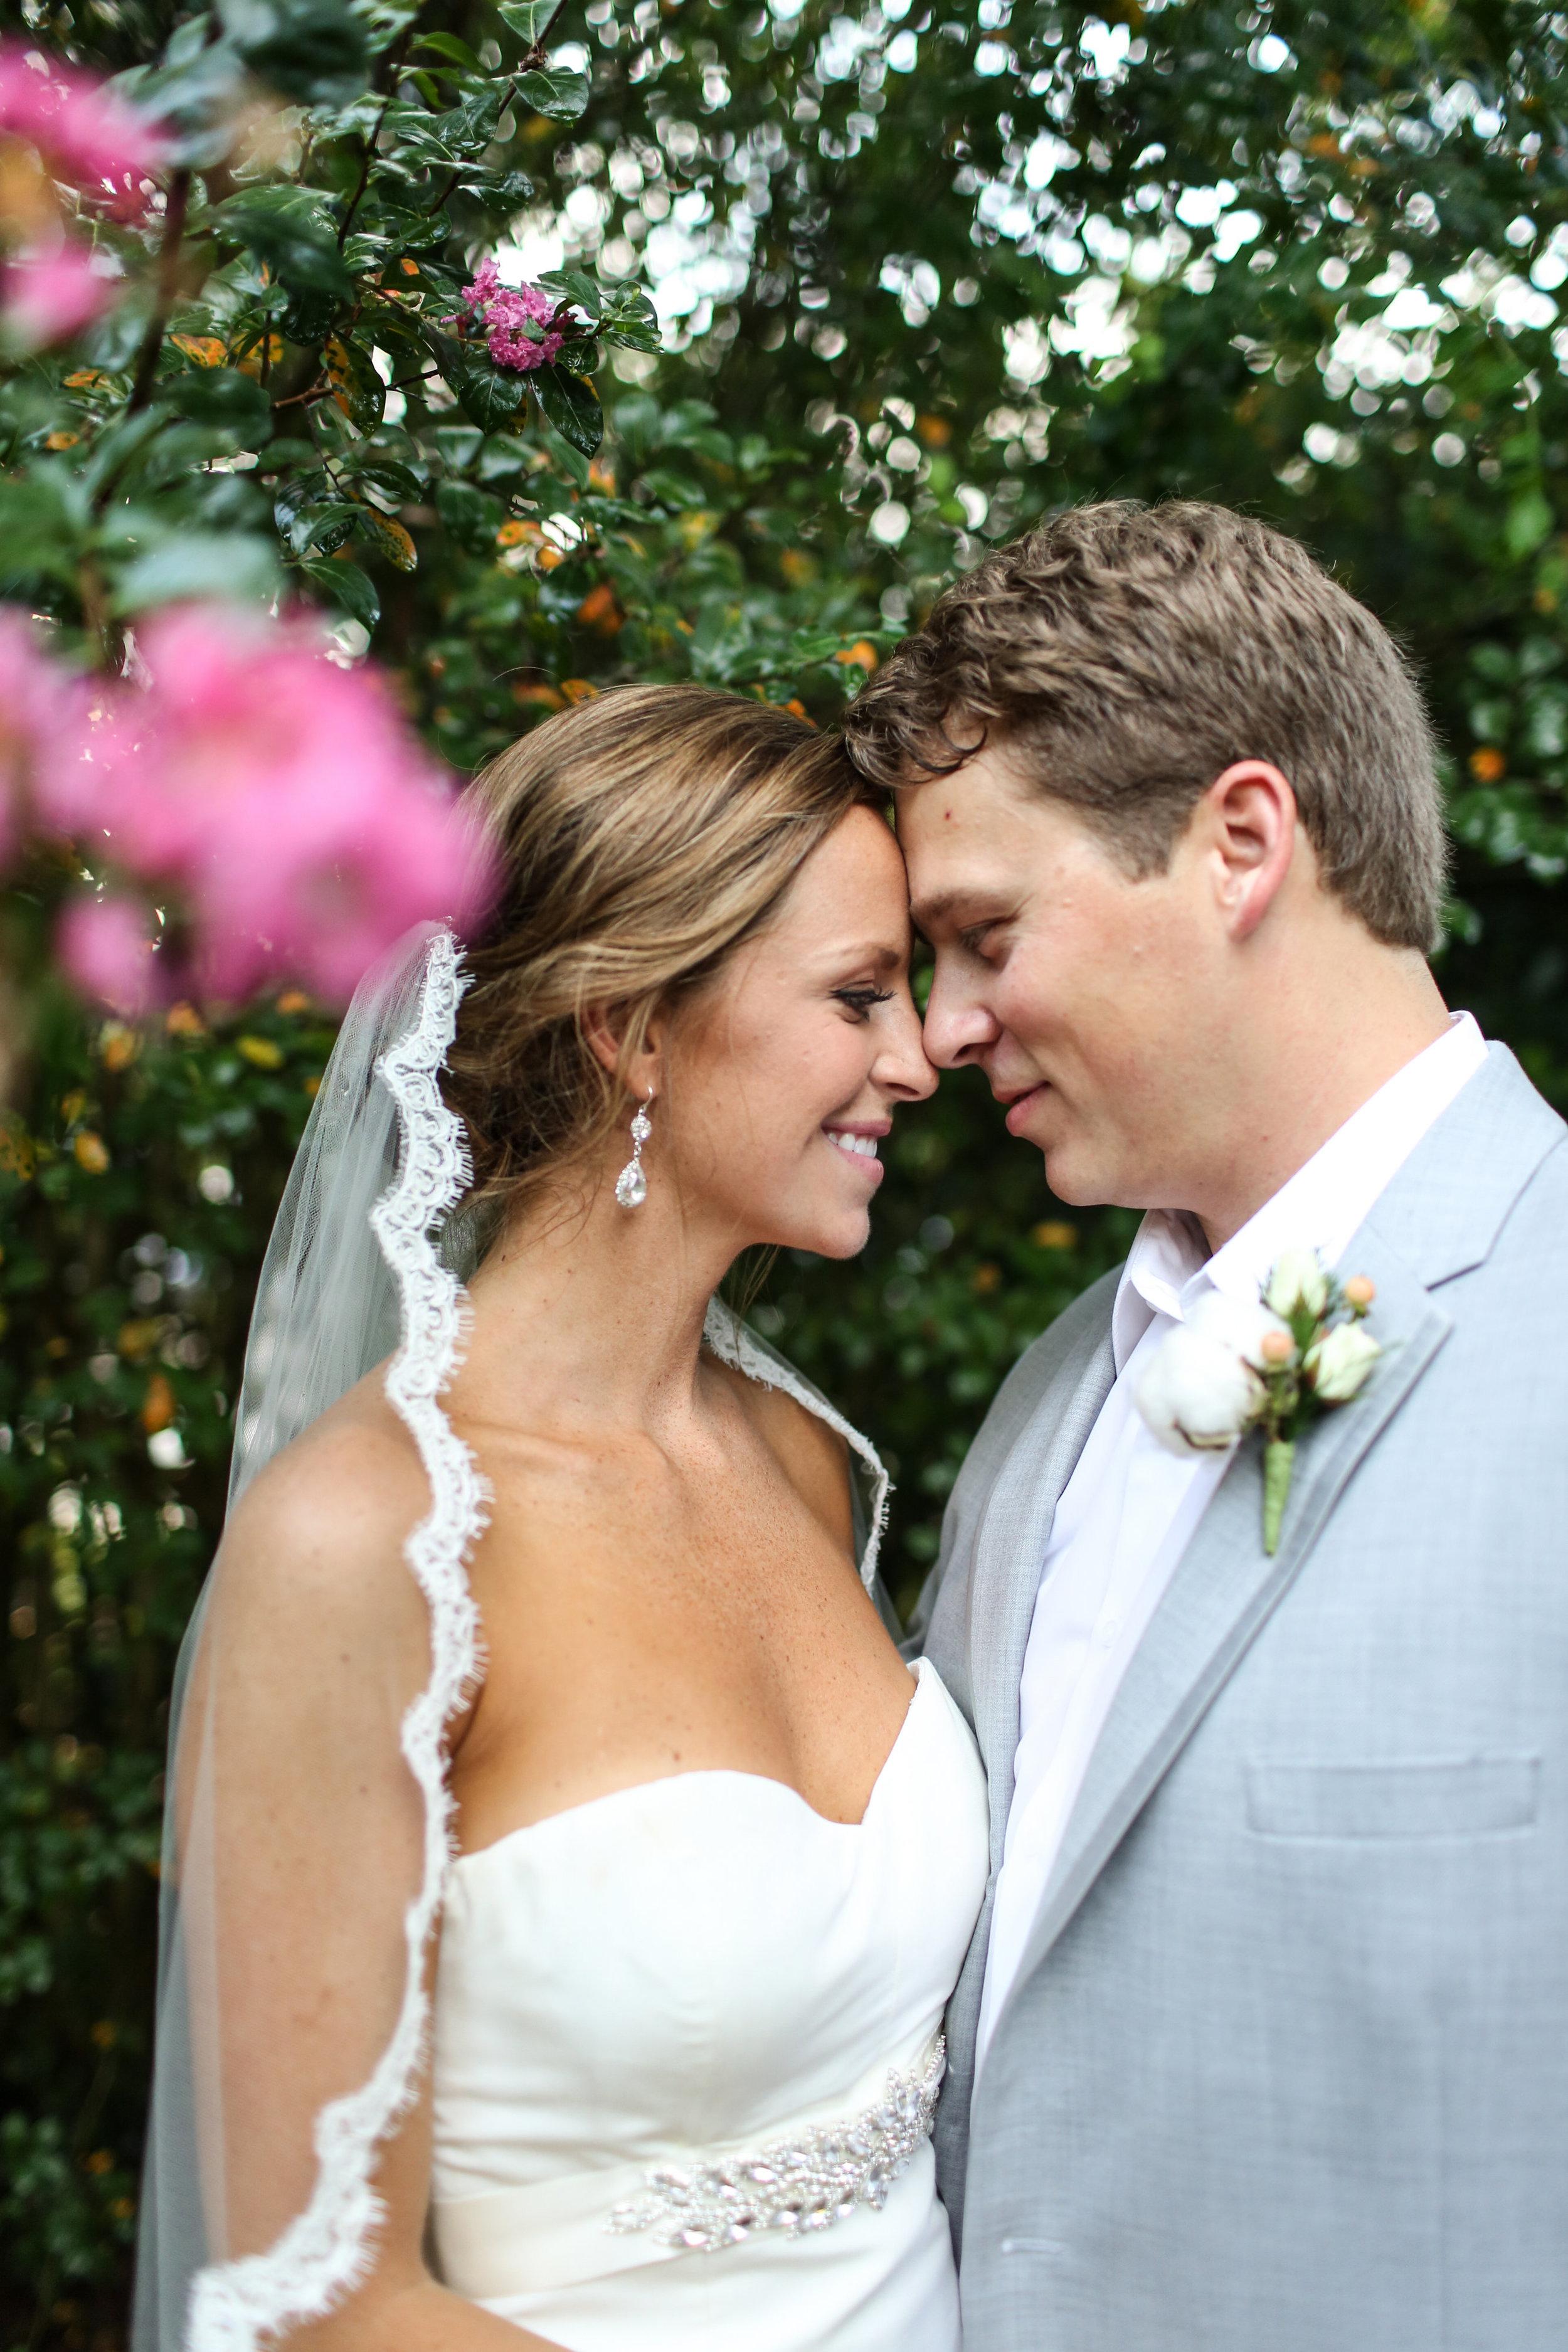 finnegan-photography-ivory-and-beau-bridal-boutique-nicole-miller-dakota-jaclyn-jordan-anne-veil-savannah-bridal-boutique-savannah-wedding-dresses-savannah-weddings-statesboro-wedding-barn-wedding-savannah-bridal-georgia-bridal-boutique-20.jpg